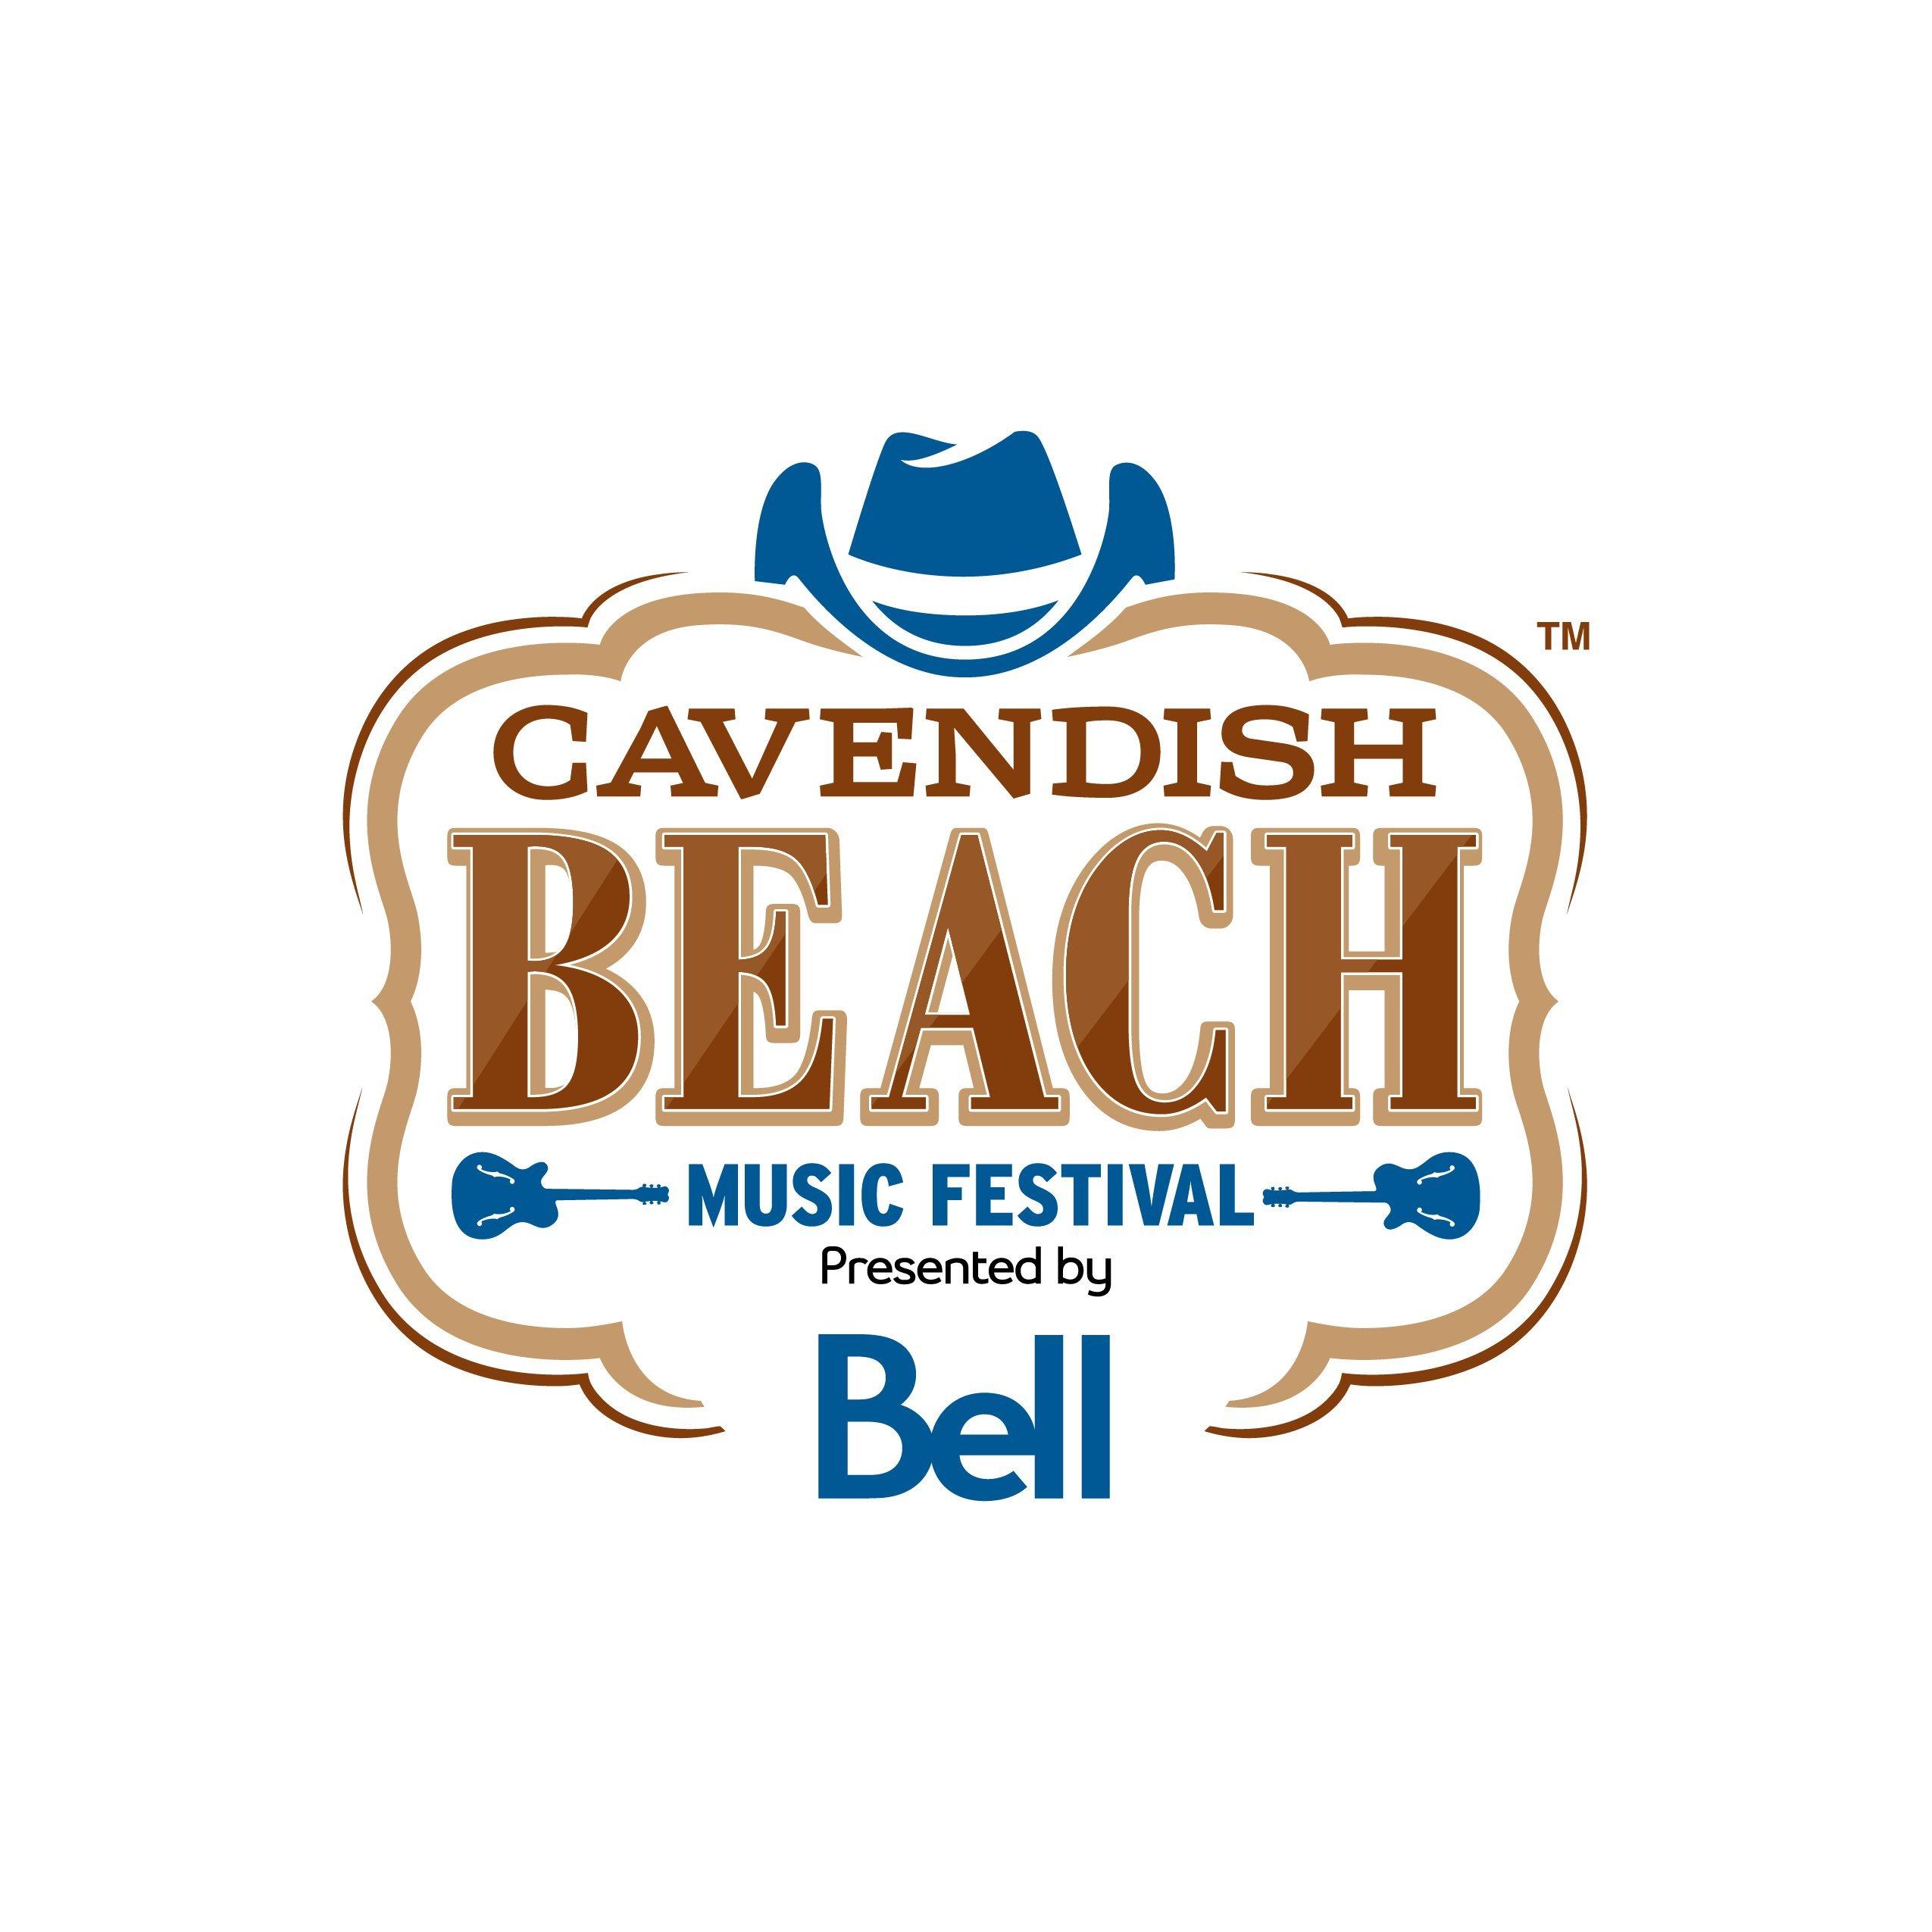 CavendishFest